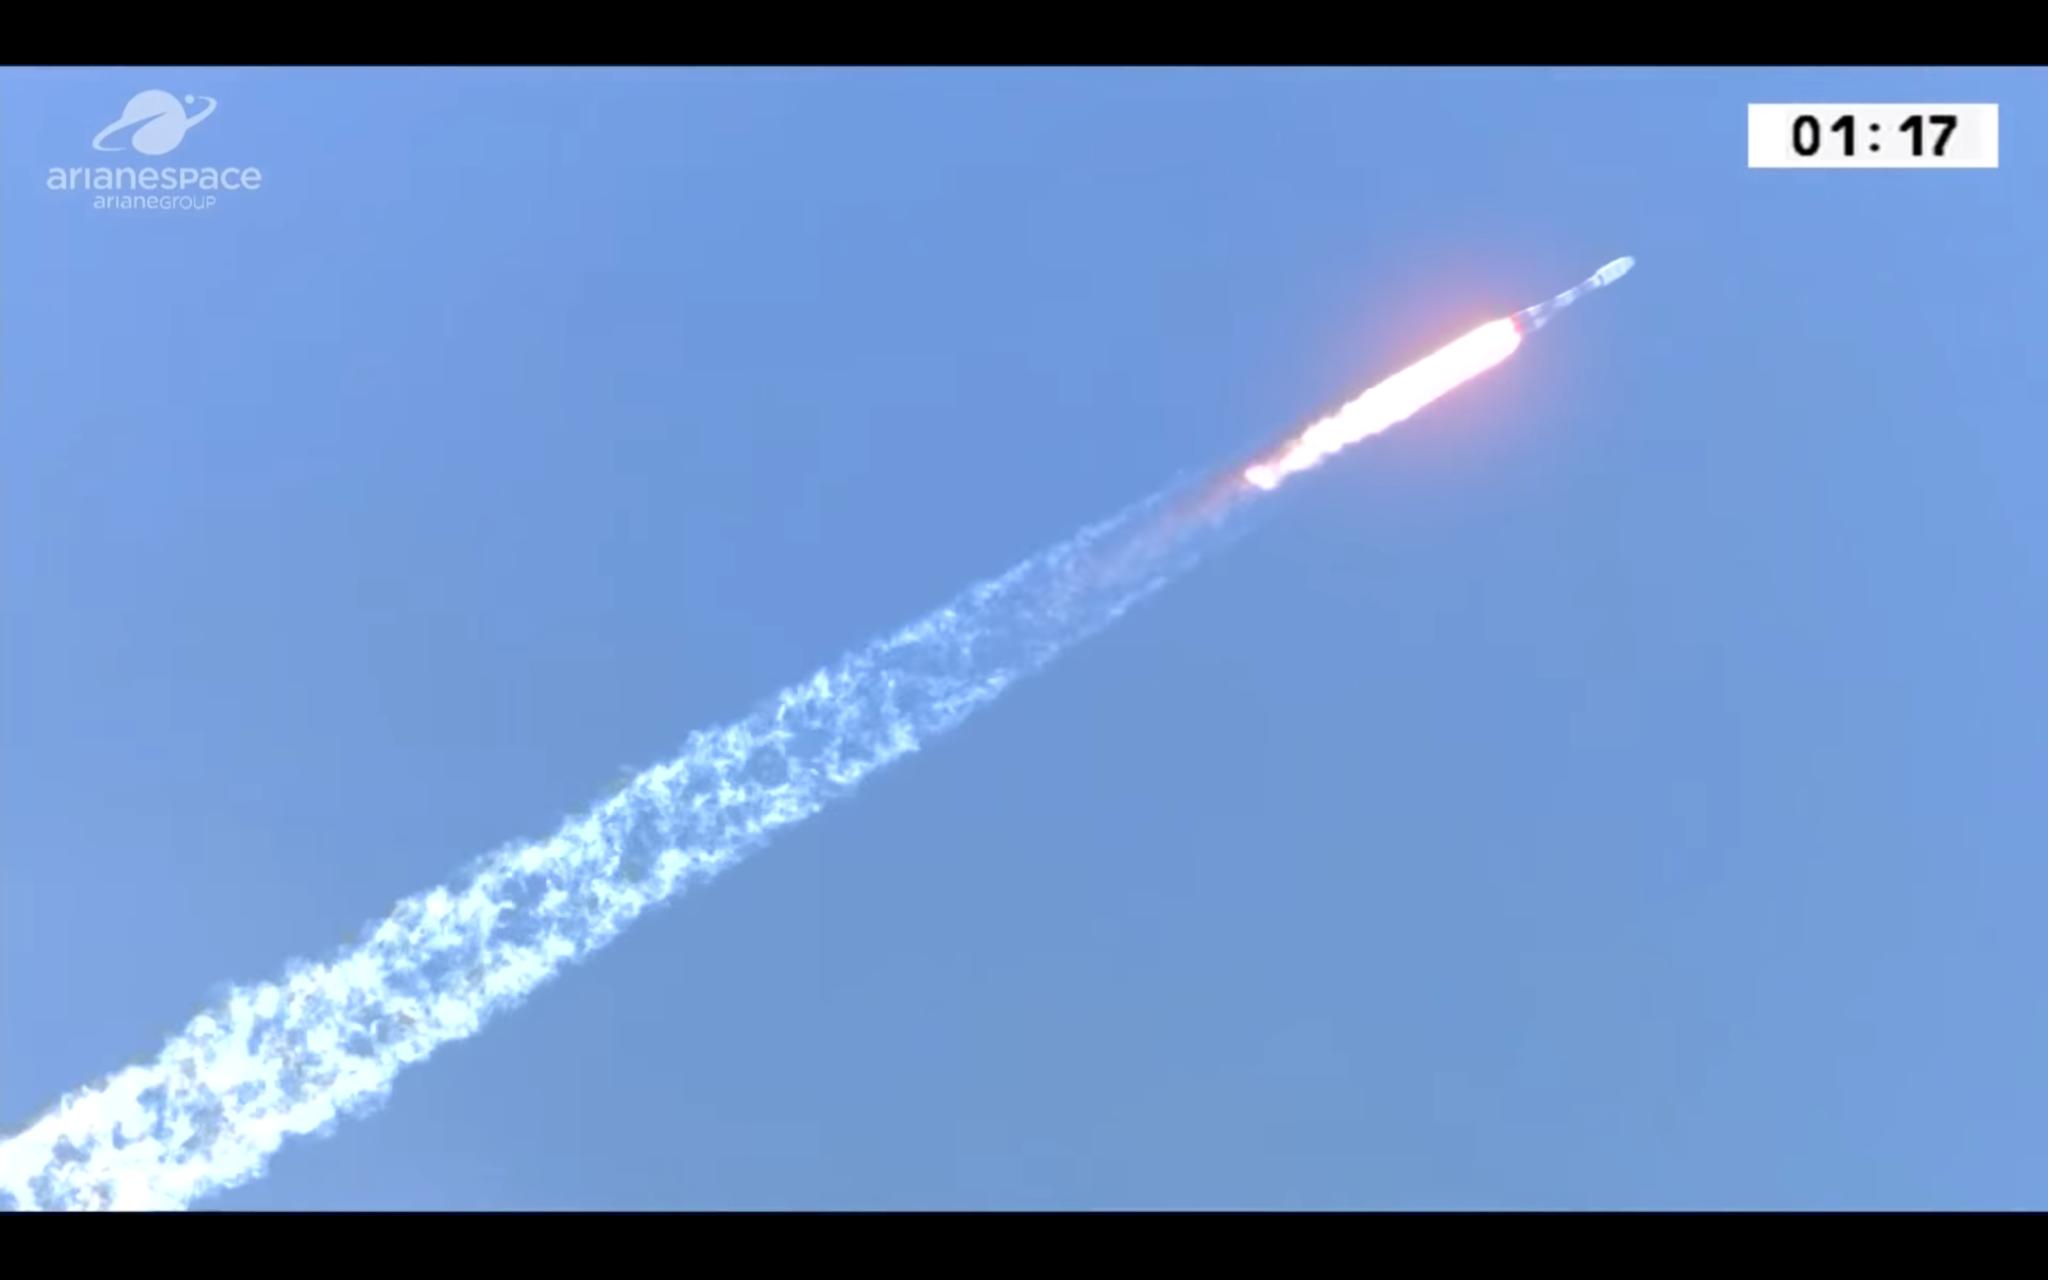 Soyuz O3b Arianespace SES VS22